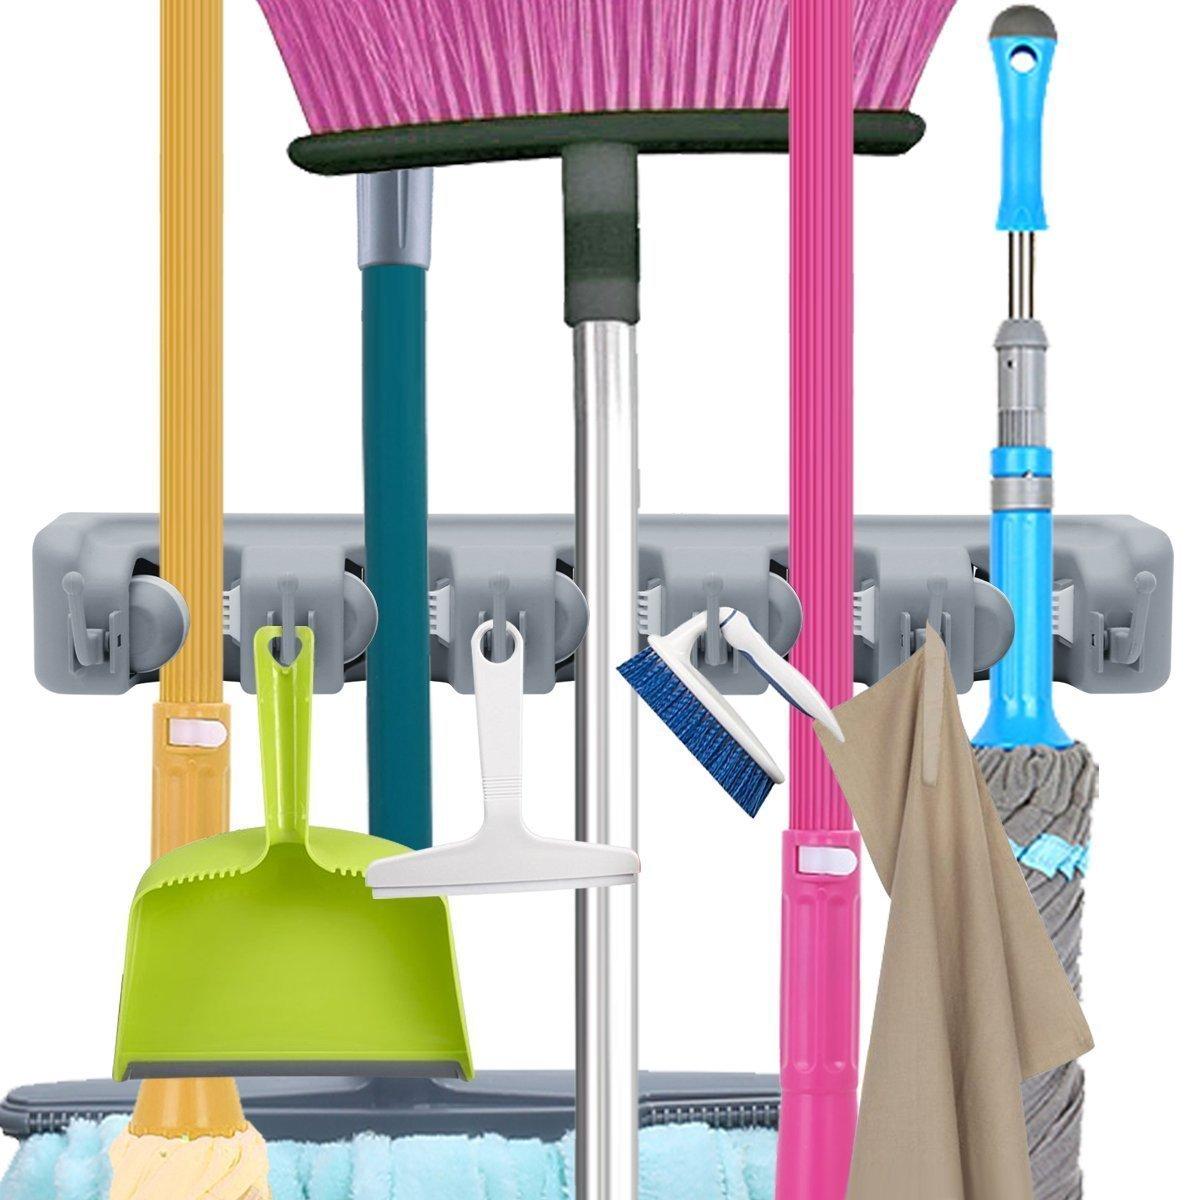 wllindustry Mop Broom Holder Garage Storage Hooks Wall Mounted Organizer Home Tools Storage Rack for Kitchen, Garage, Commercial Bathroom Laundry Room Closet Gardening(5 Position 6 Hooks)